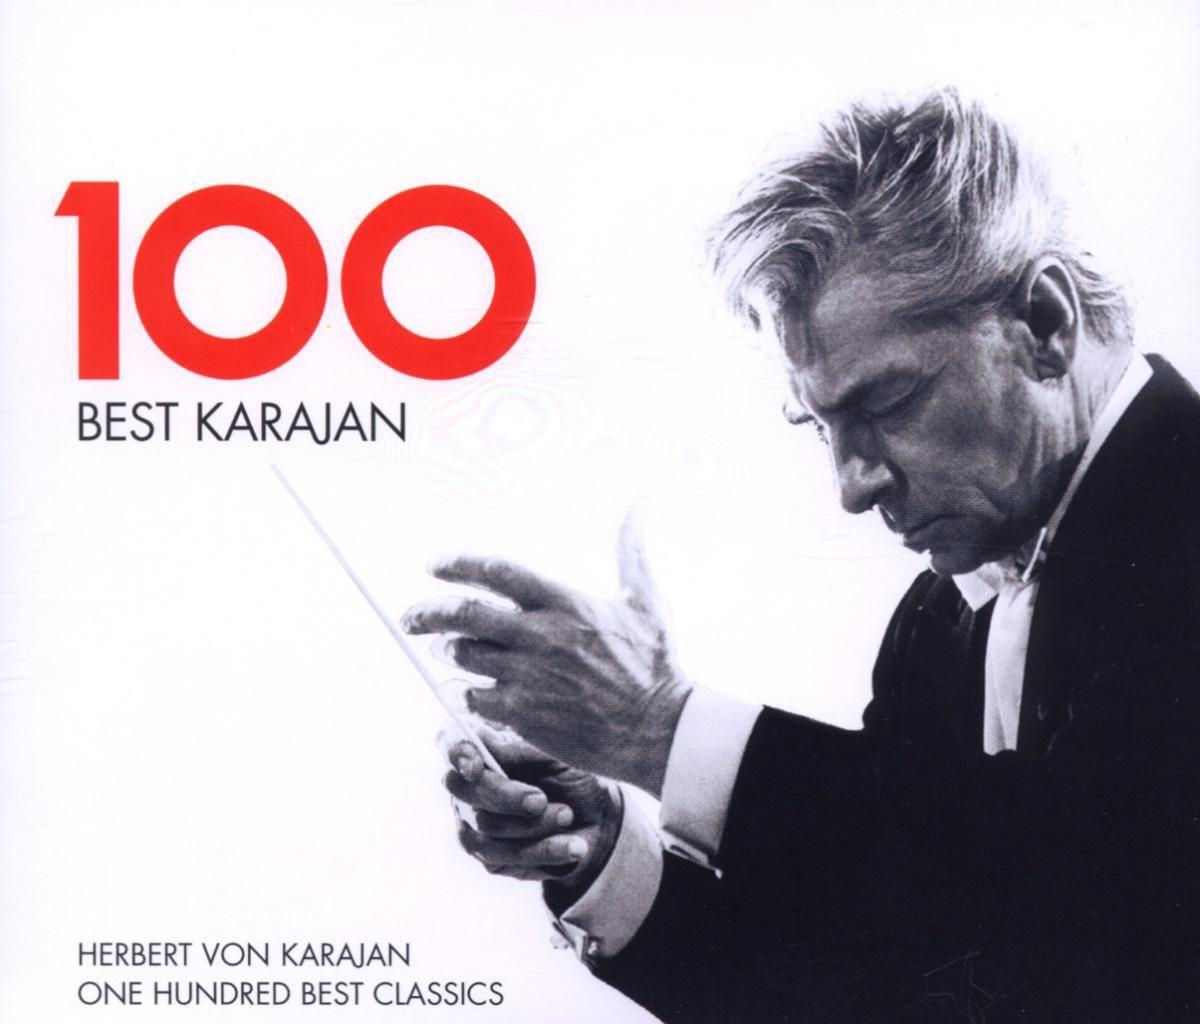 herbert von karajan best 100 karajan cd opus3a. Black Bedroom Furniture Sets. Home Design Ideas